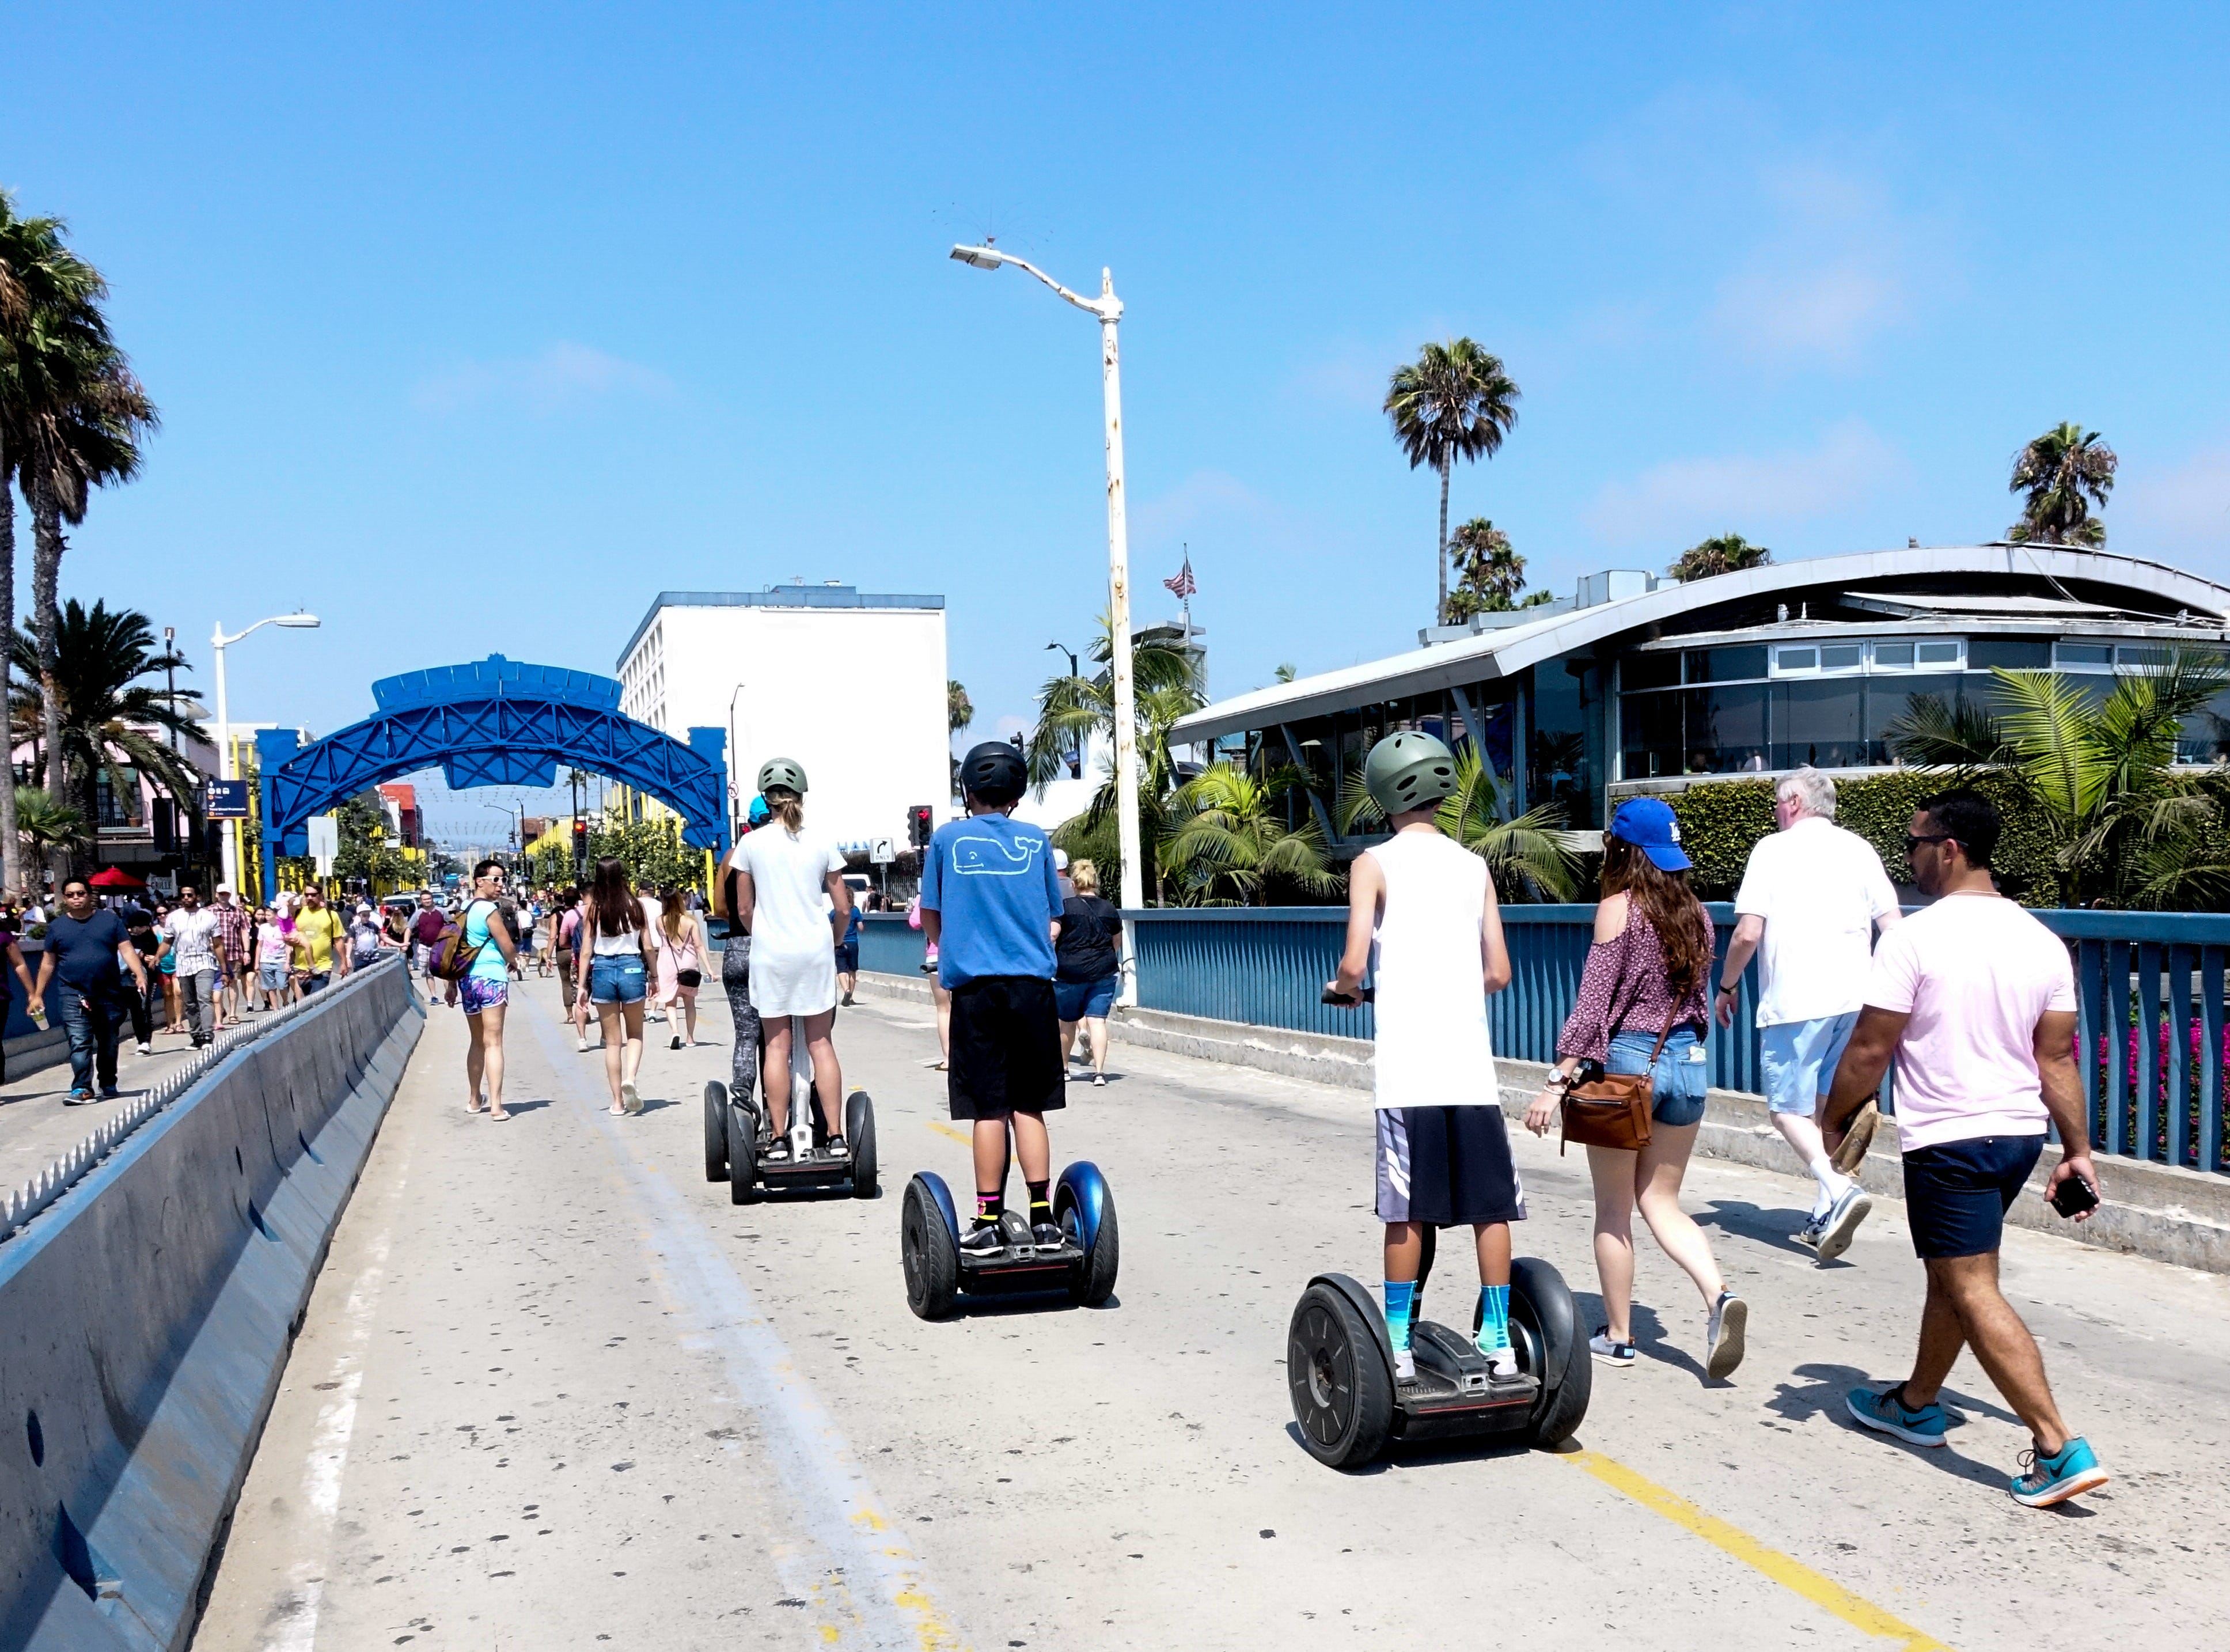 Riding Segways off the Santa Monica Pier